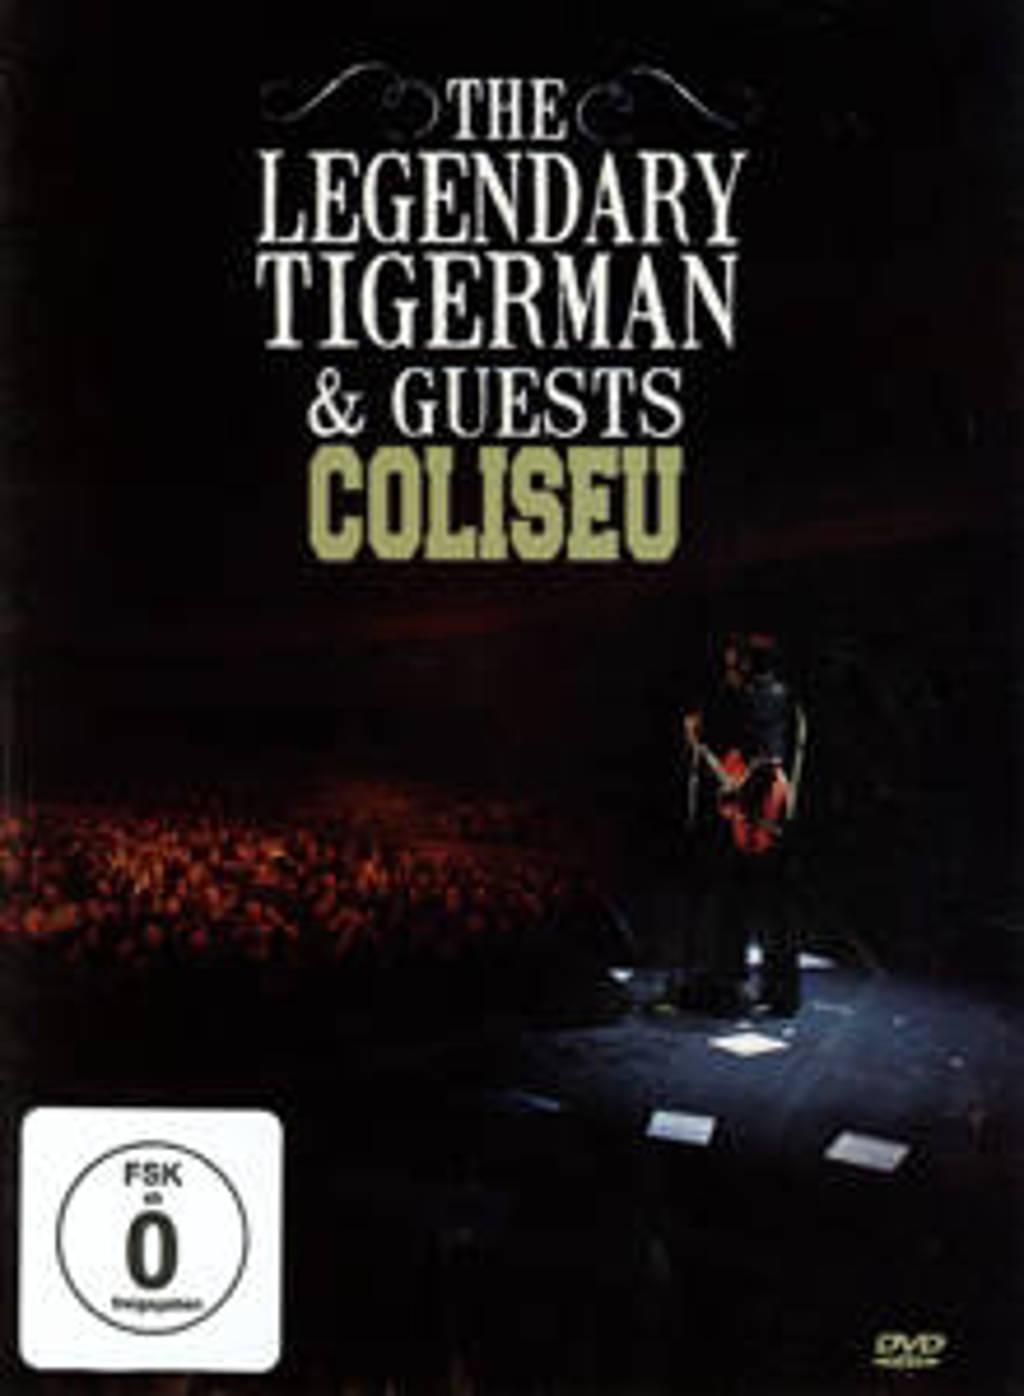 The Legendary Tigerman - Coliseu (DVD)